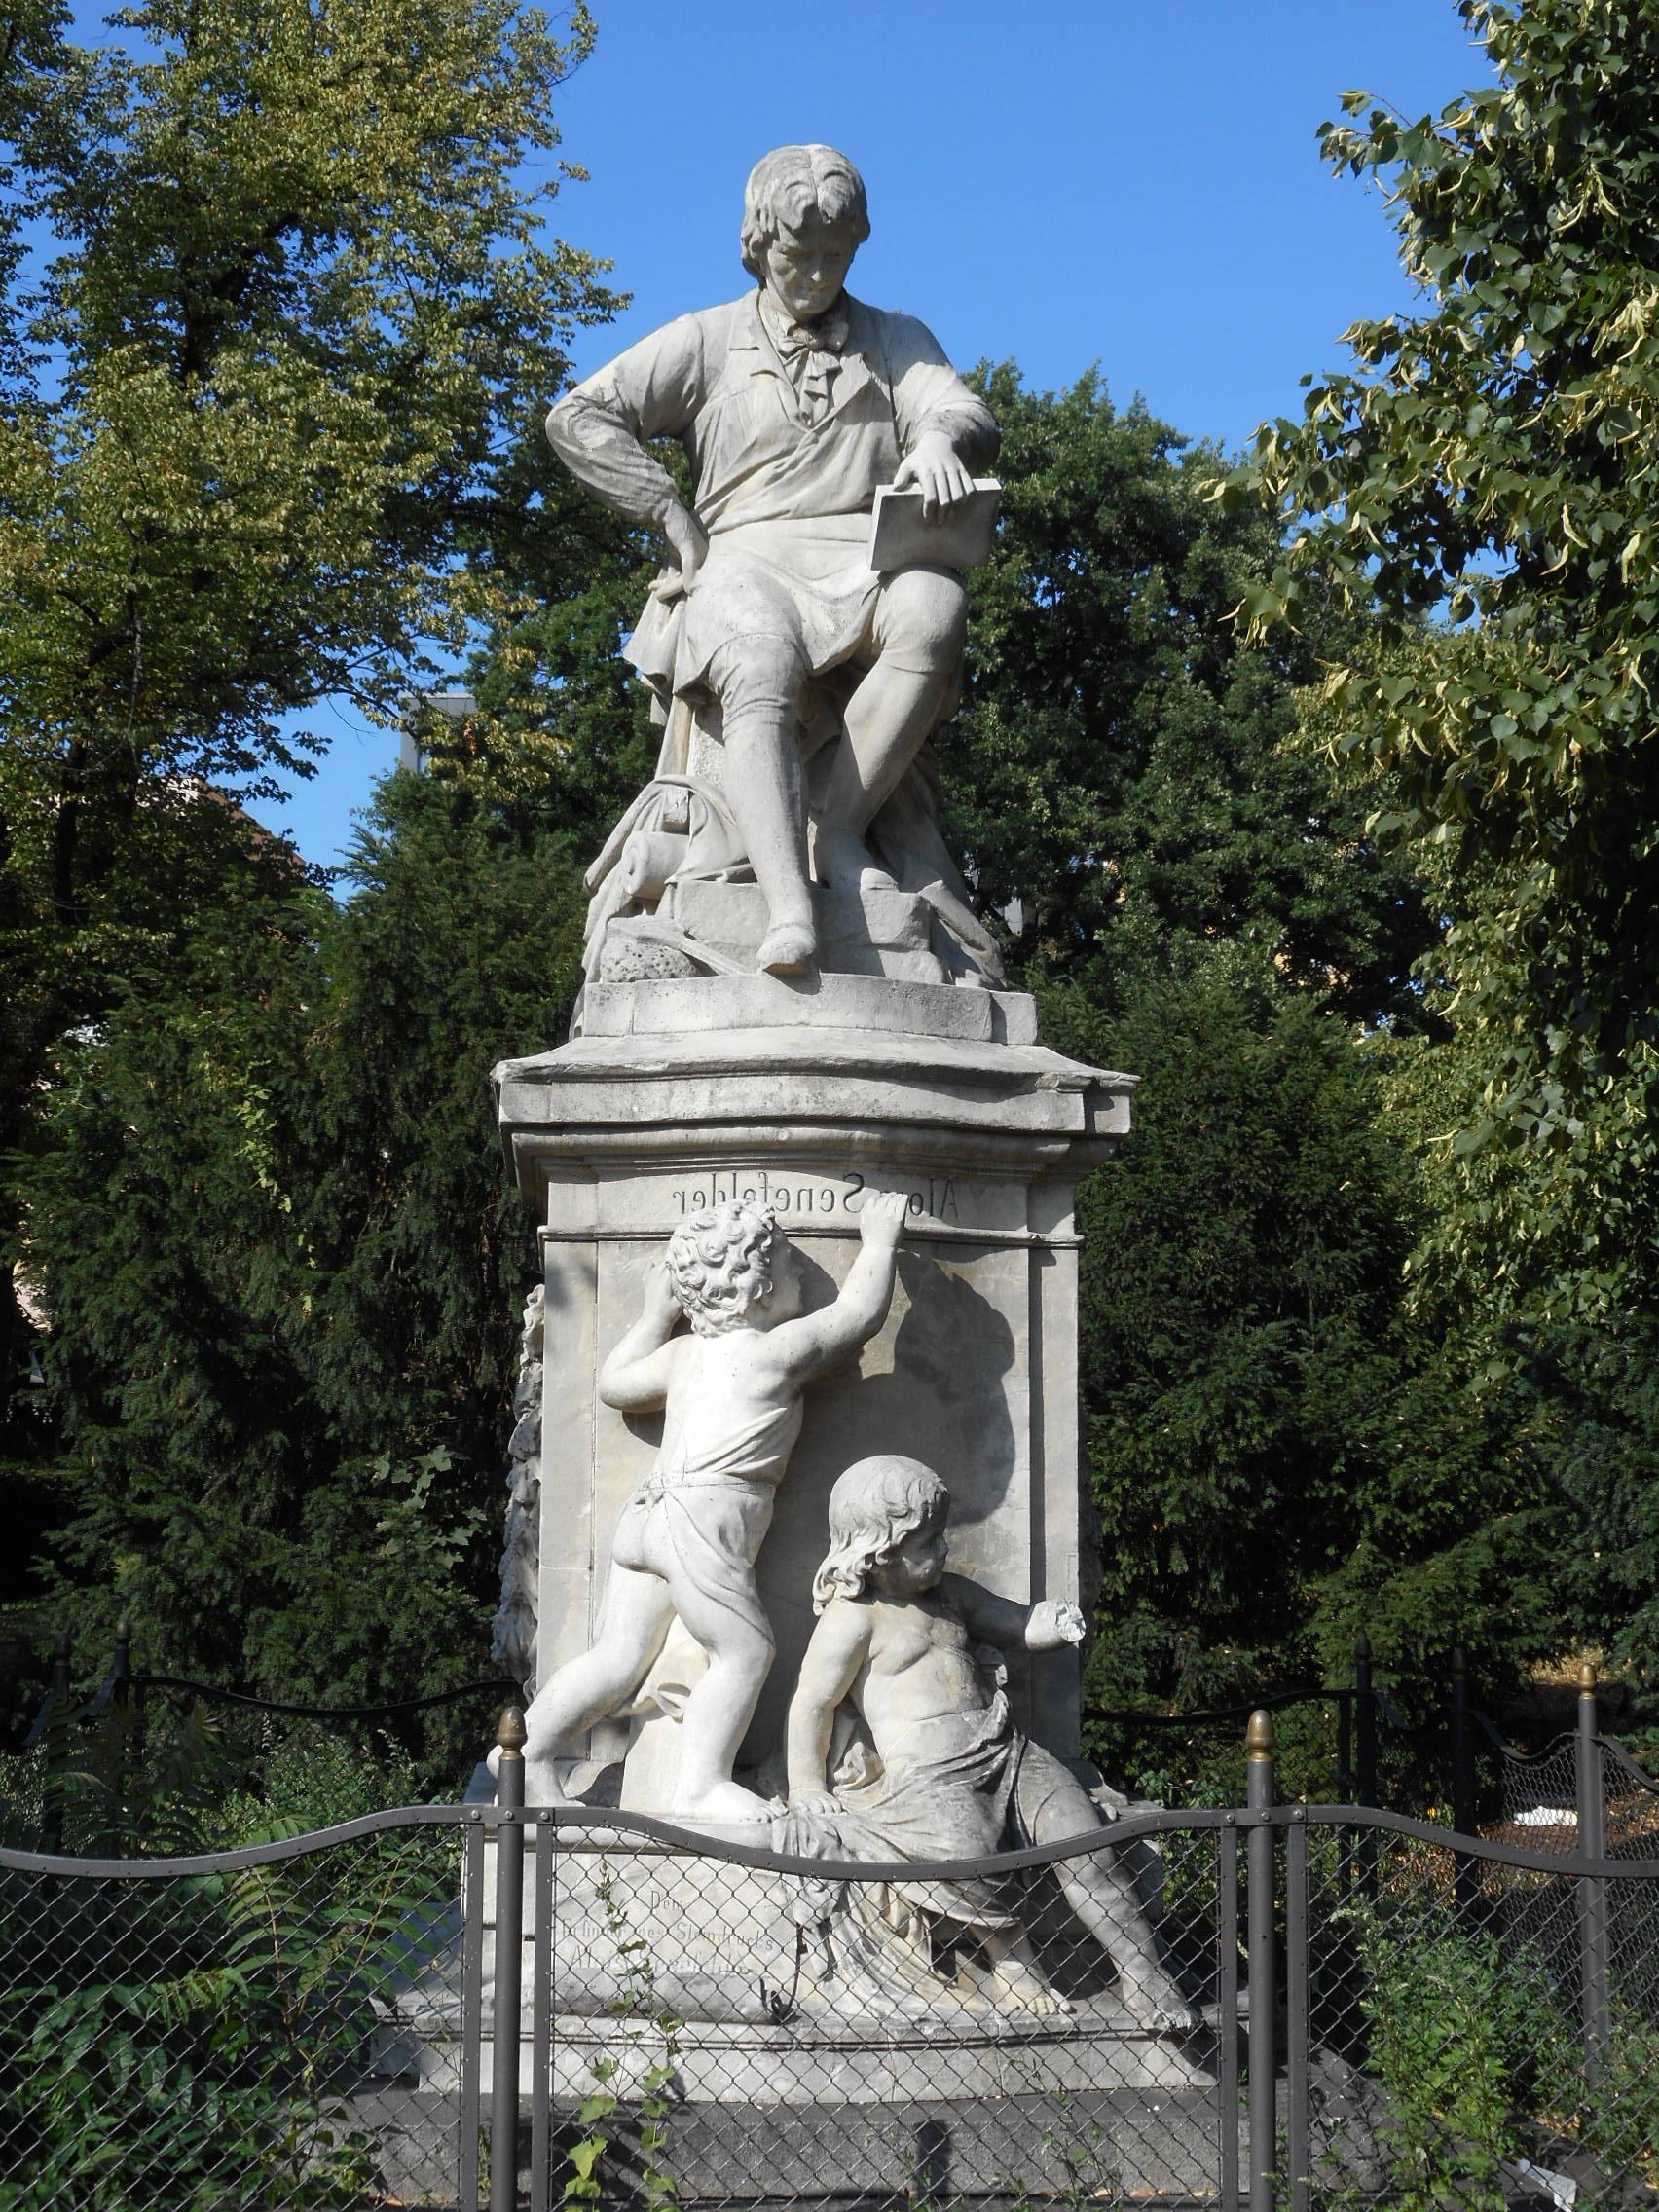 alois-senefelder-statue-whole